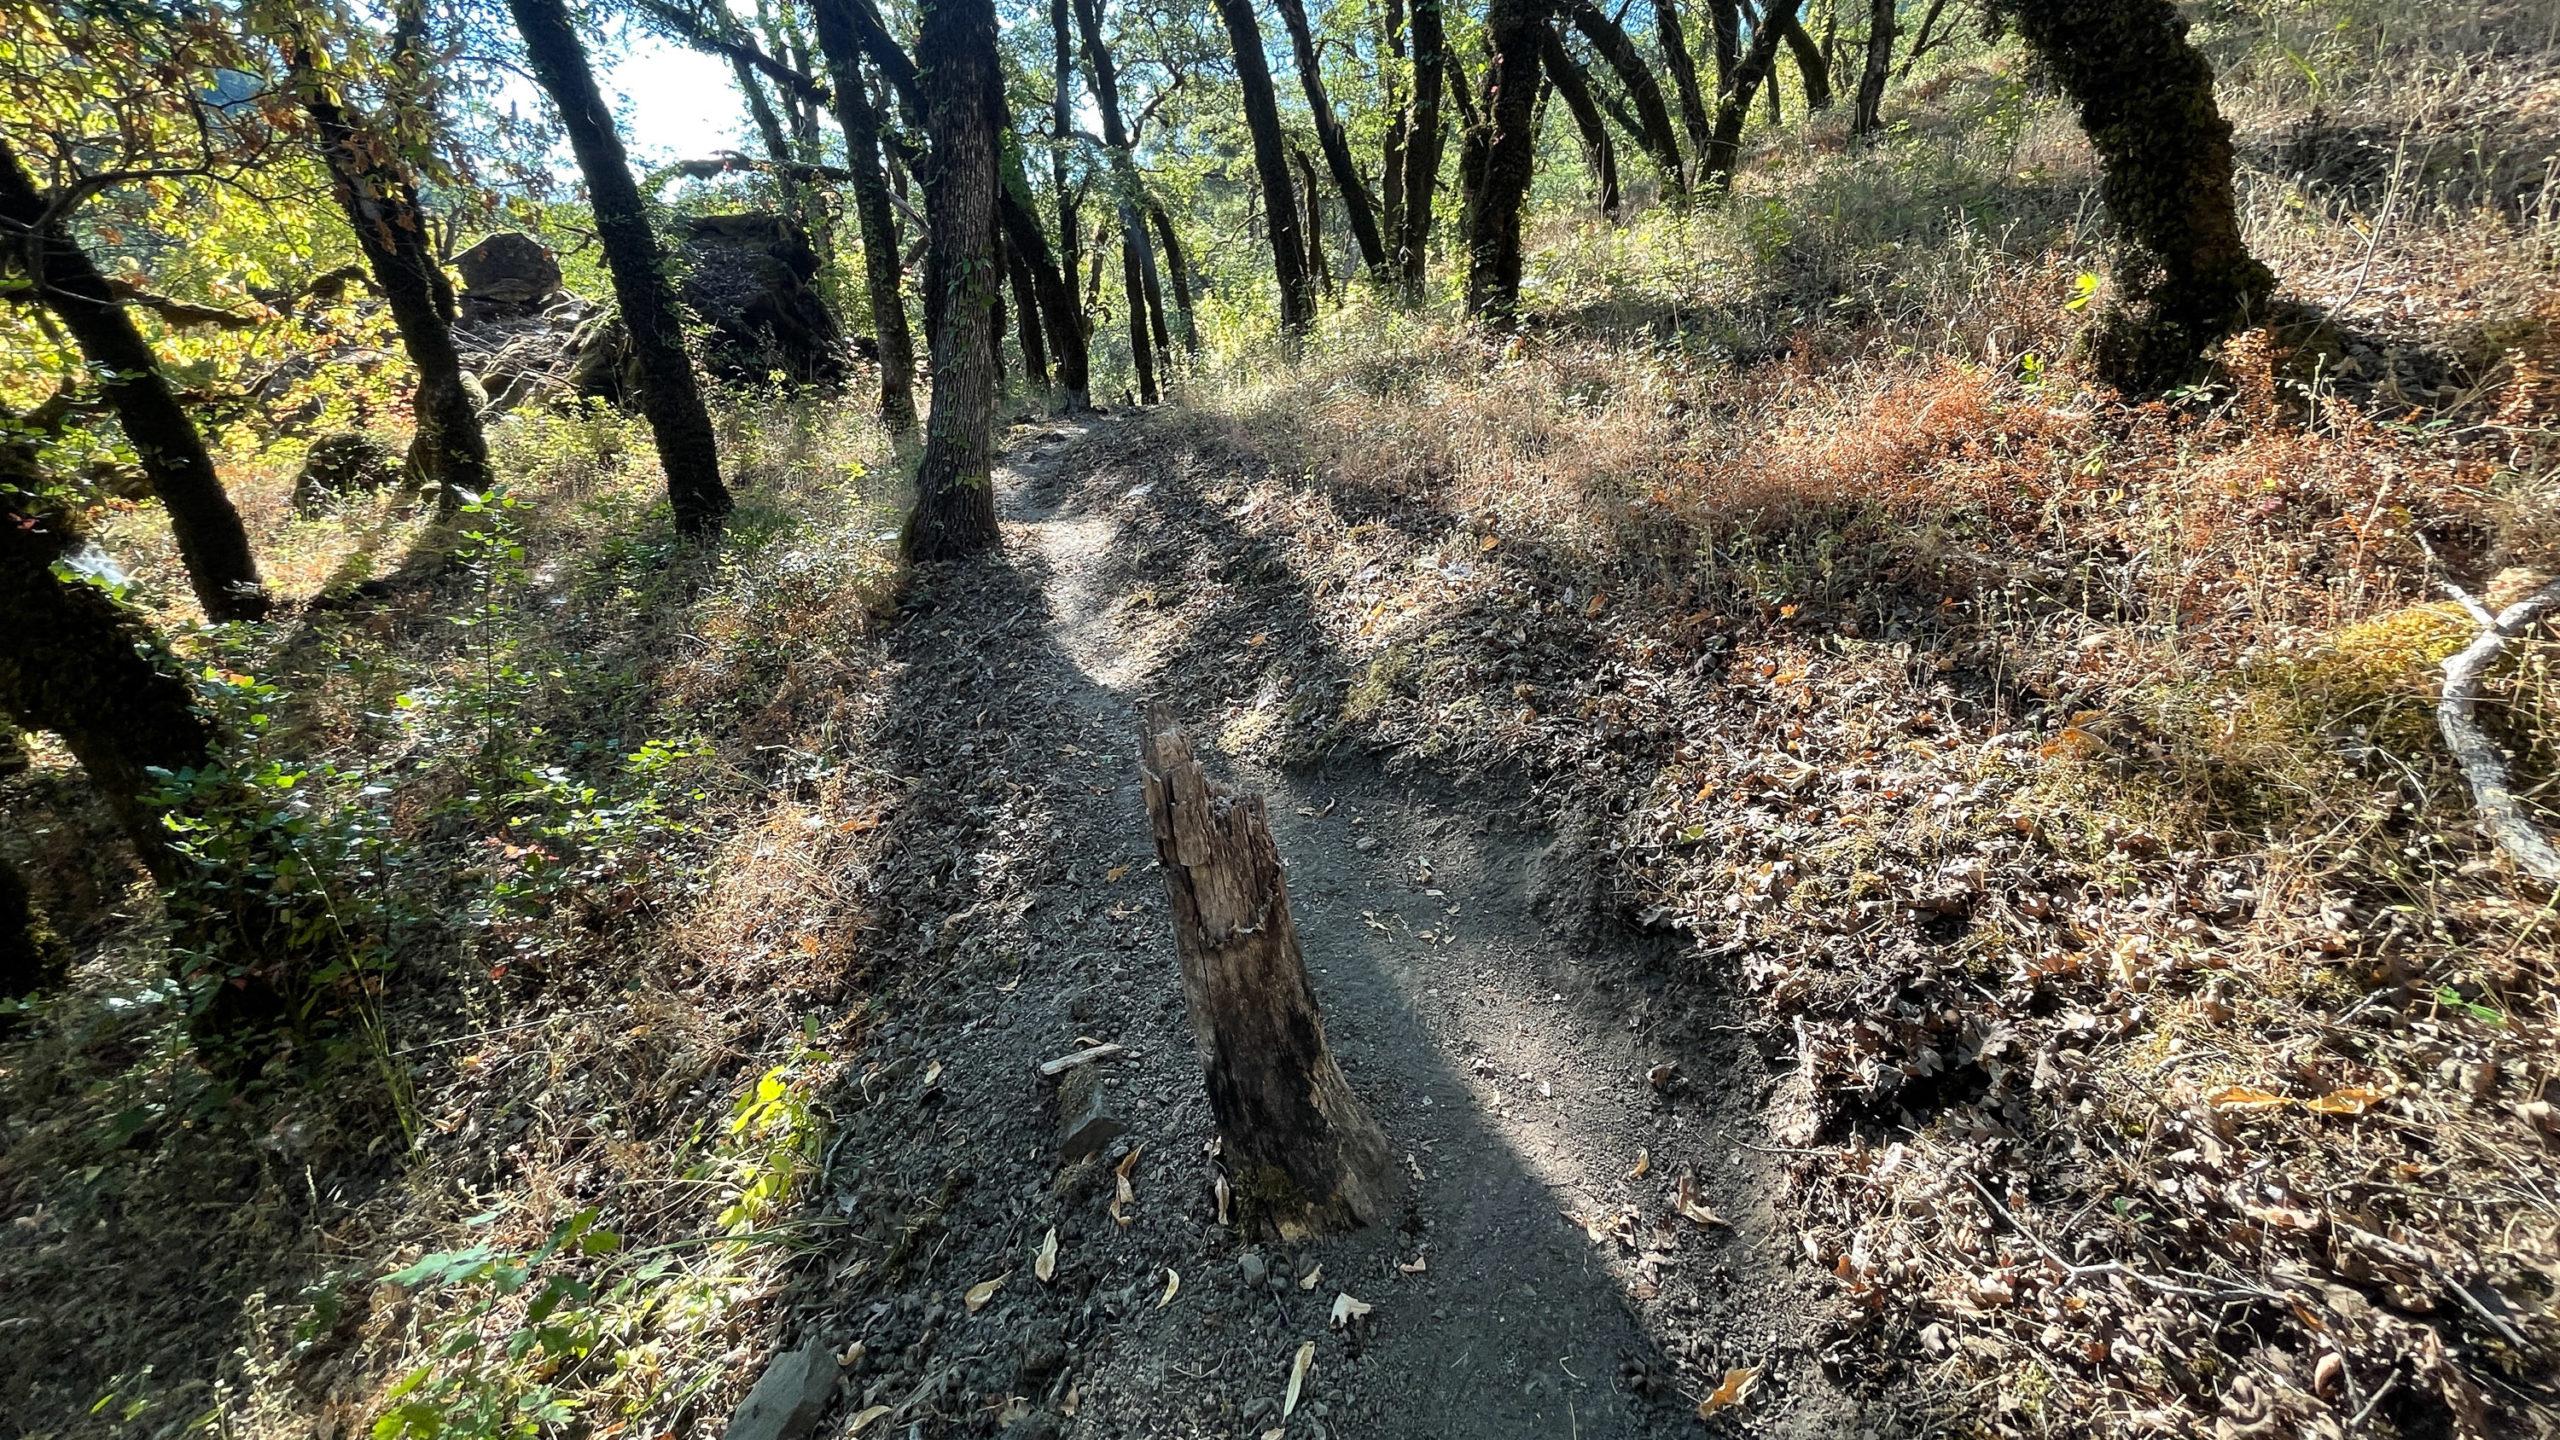 Hiking path with stump